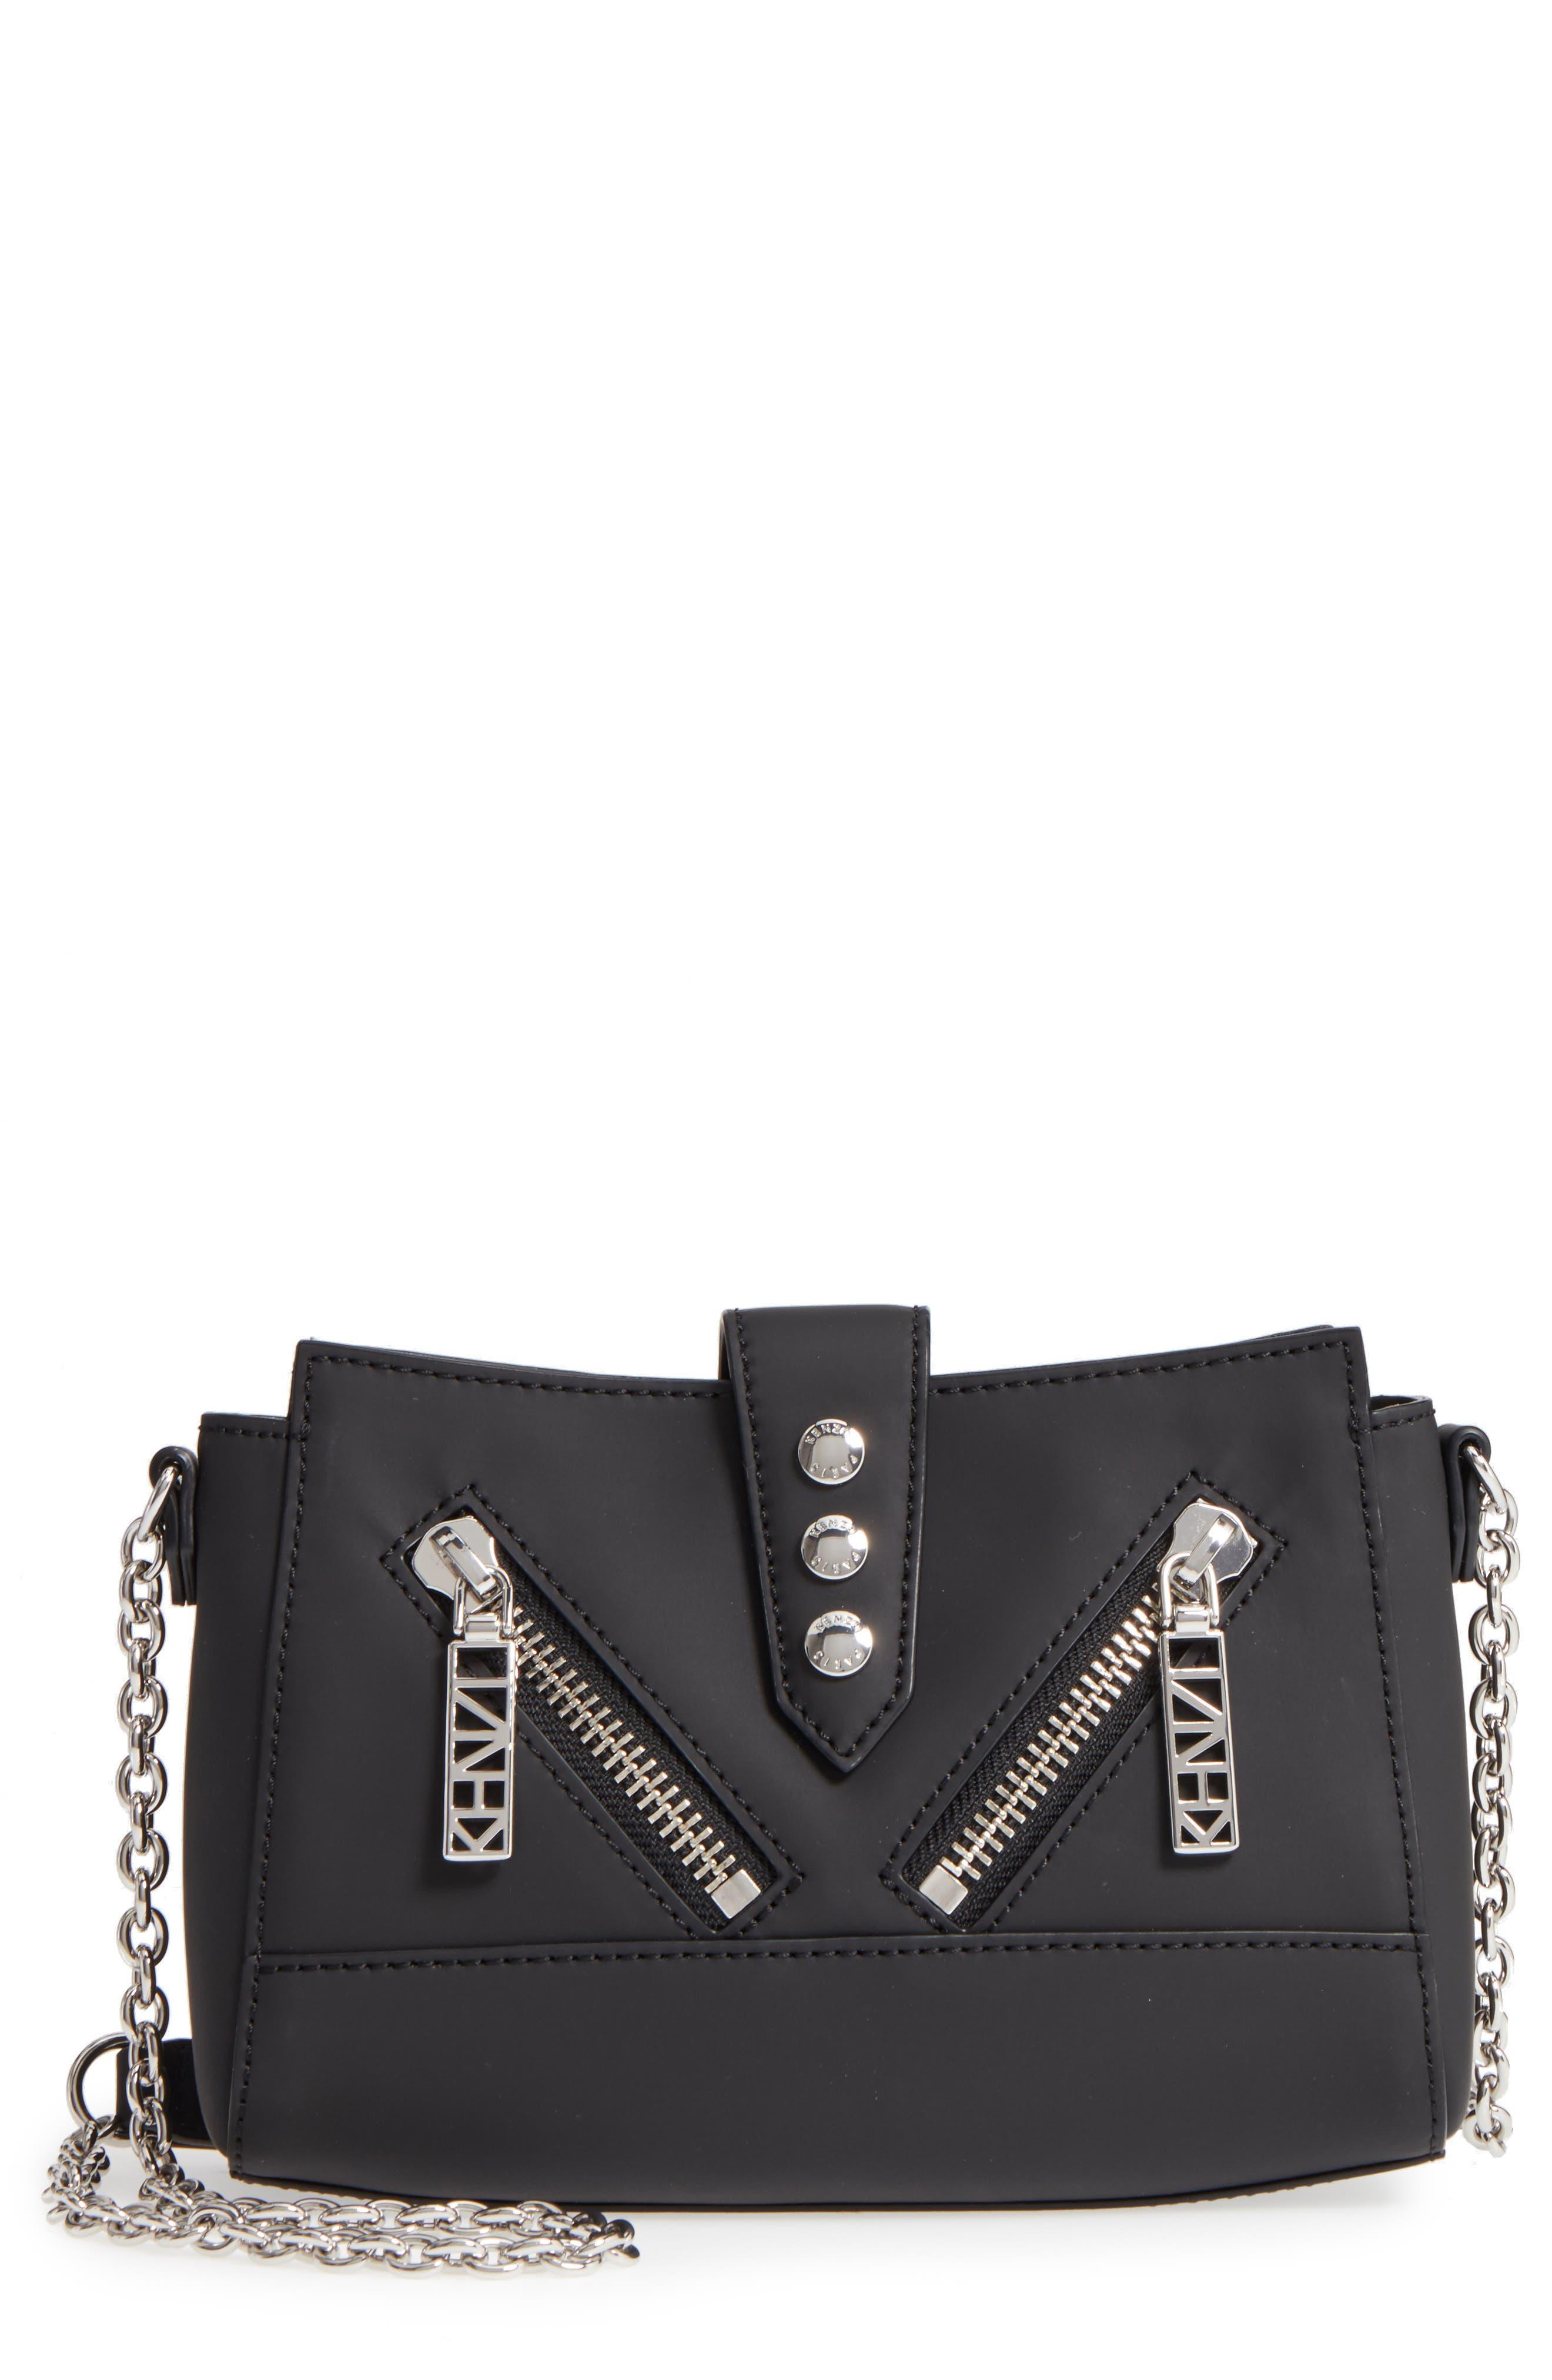 Main Image - KENZO Mini Kalifornia Grommato Leather Shoulder Bag